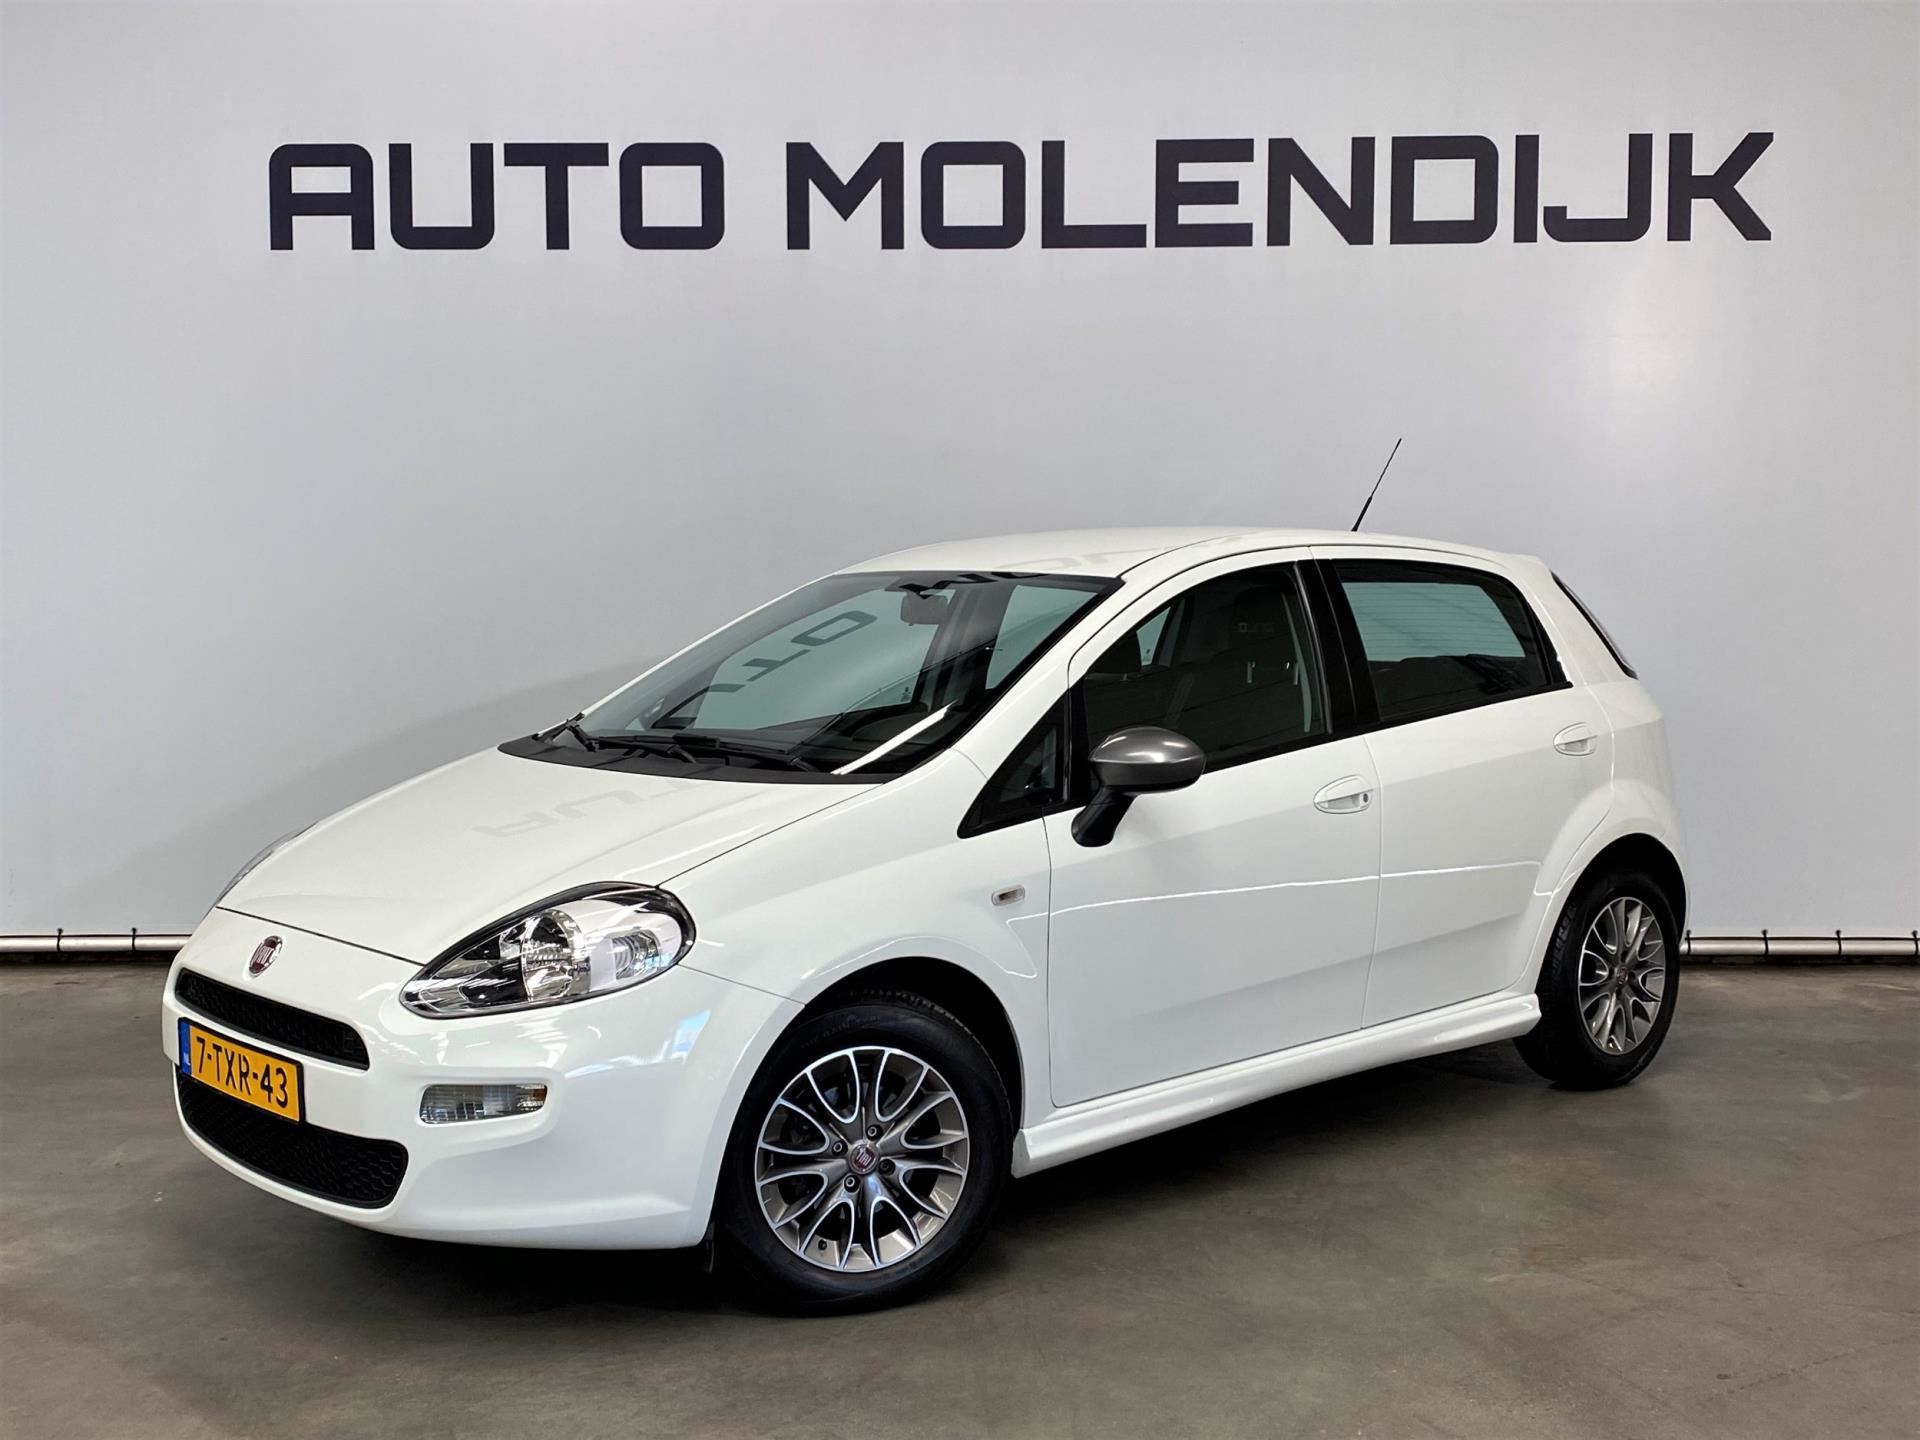 Fiat Punto Evo occasion - Auto Molendijk